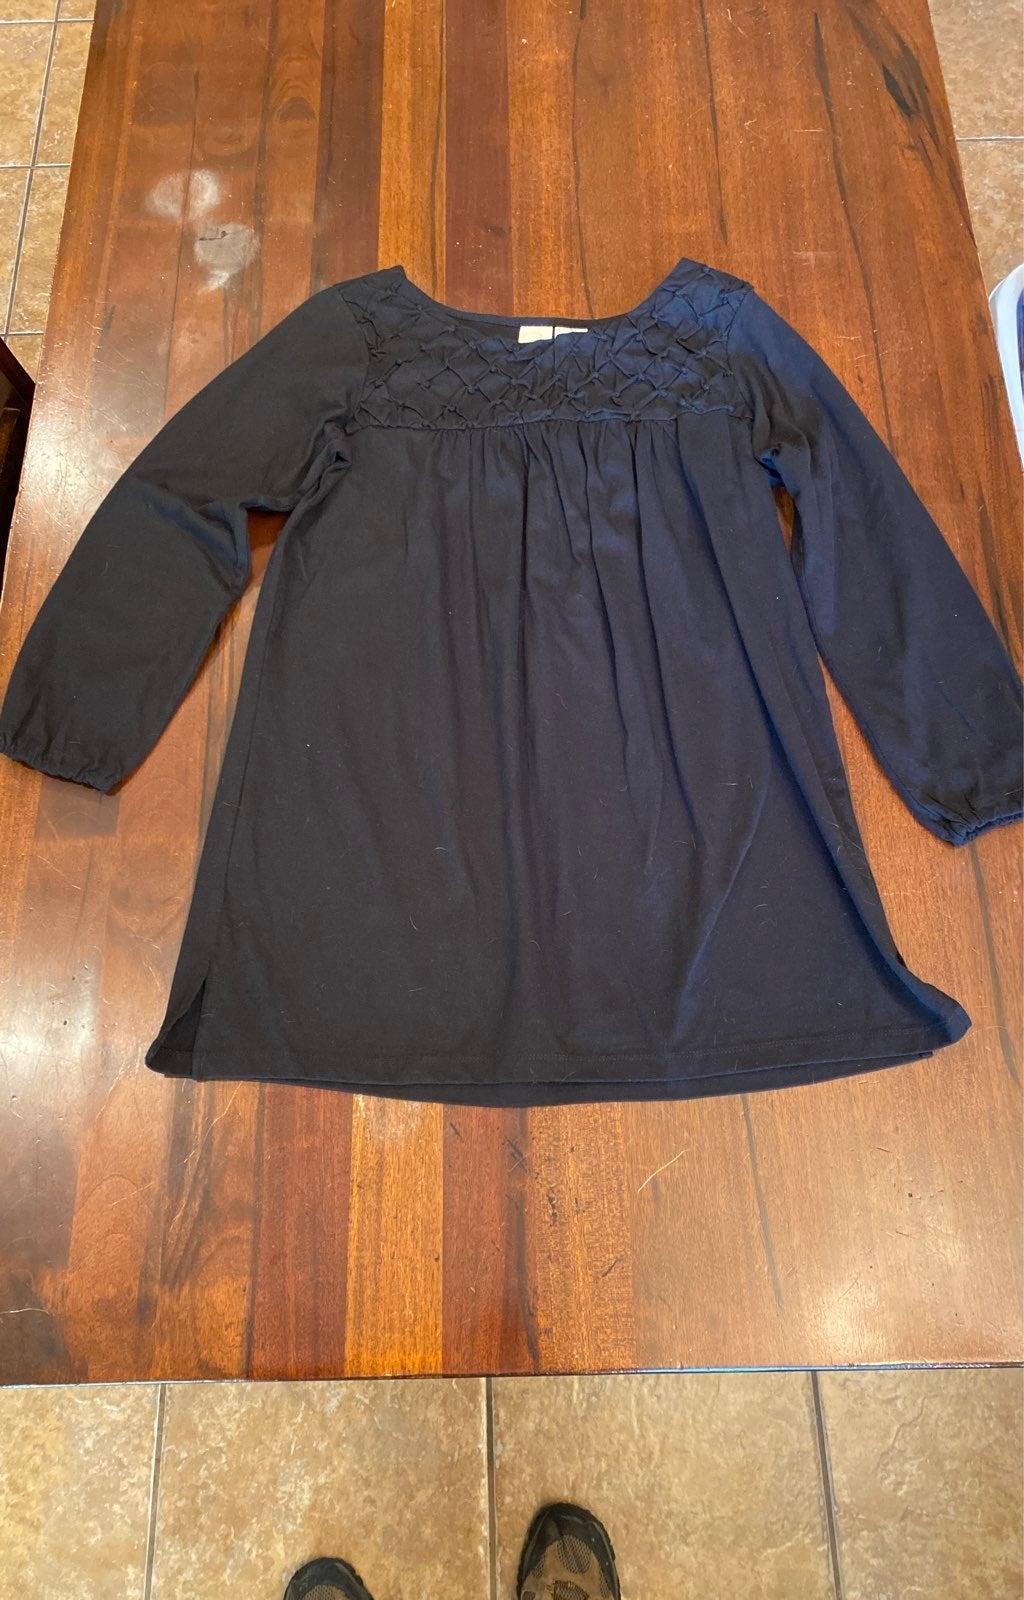 Black Tunic top by Roaman's